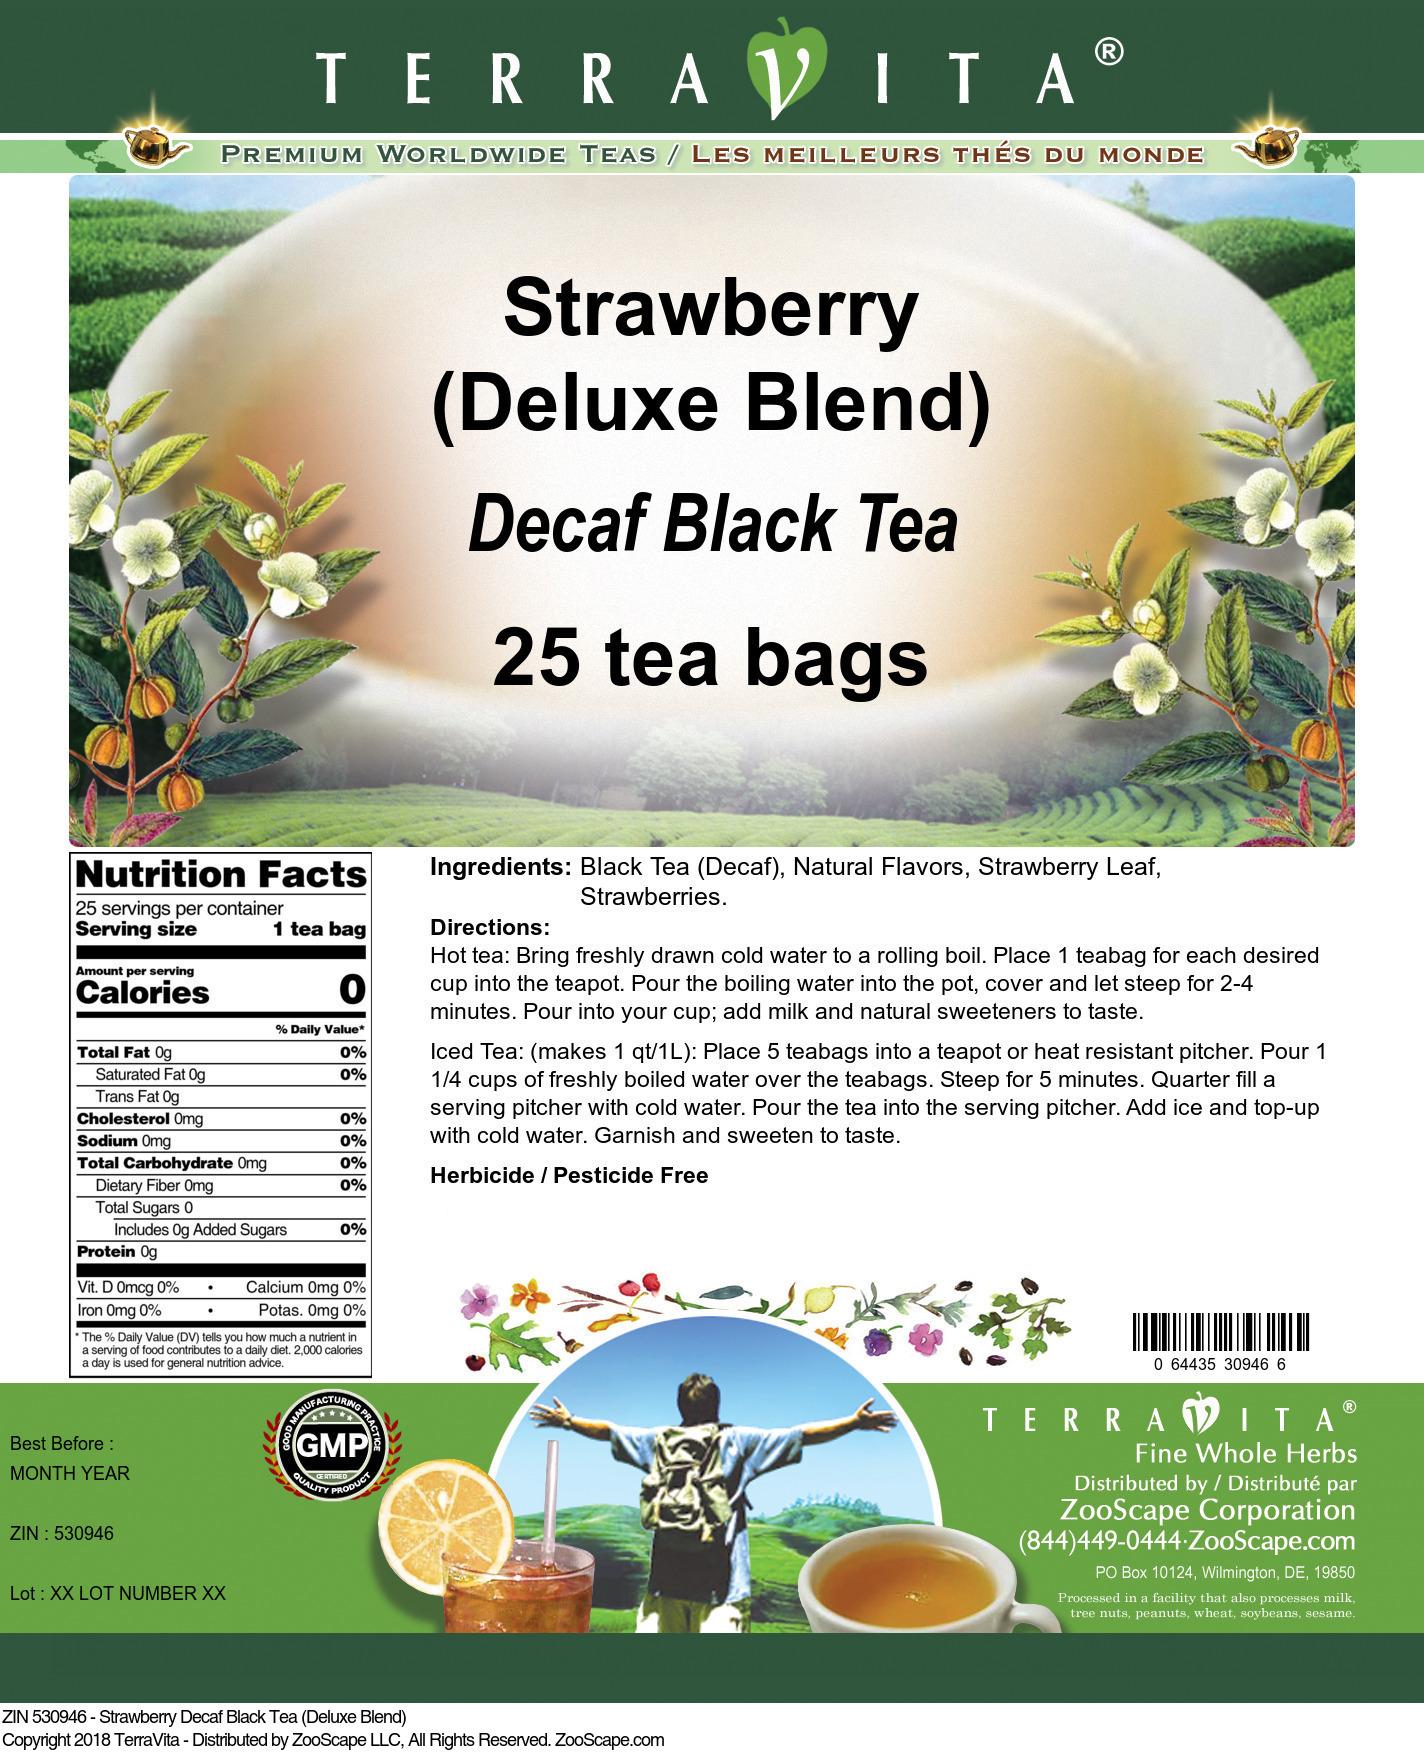 Strawberry Decaf Black Tea (Deluxe Blend)